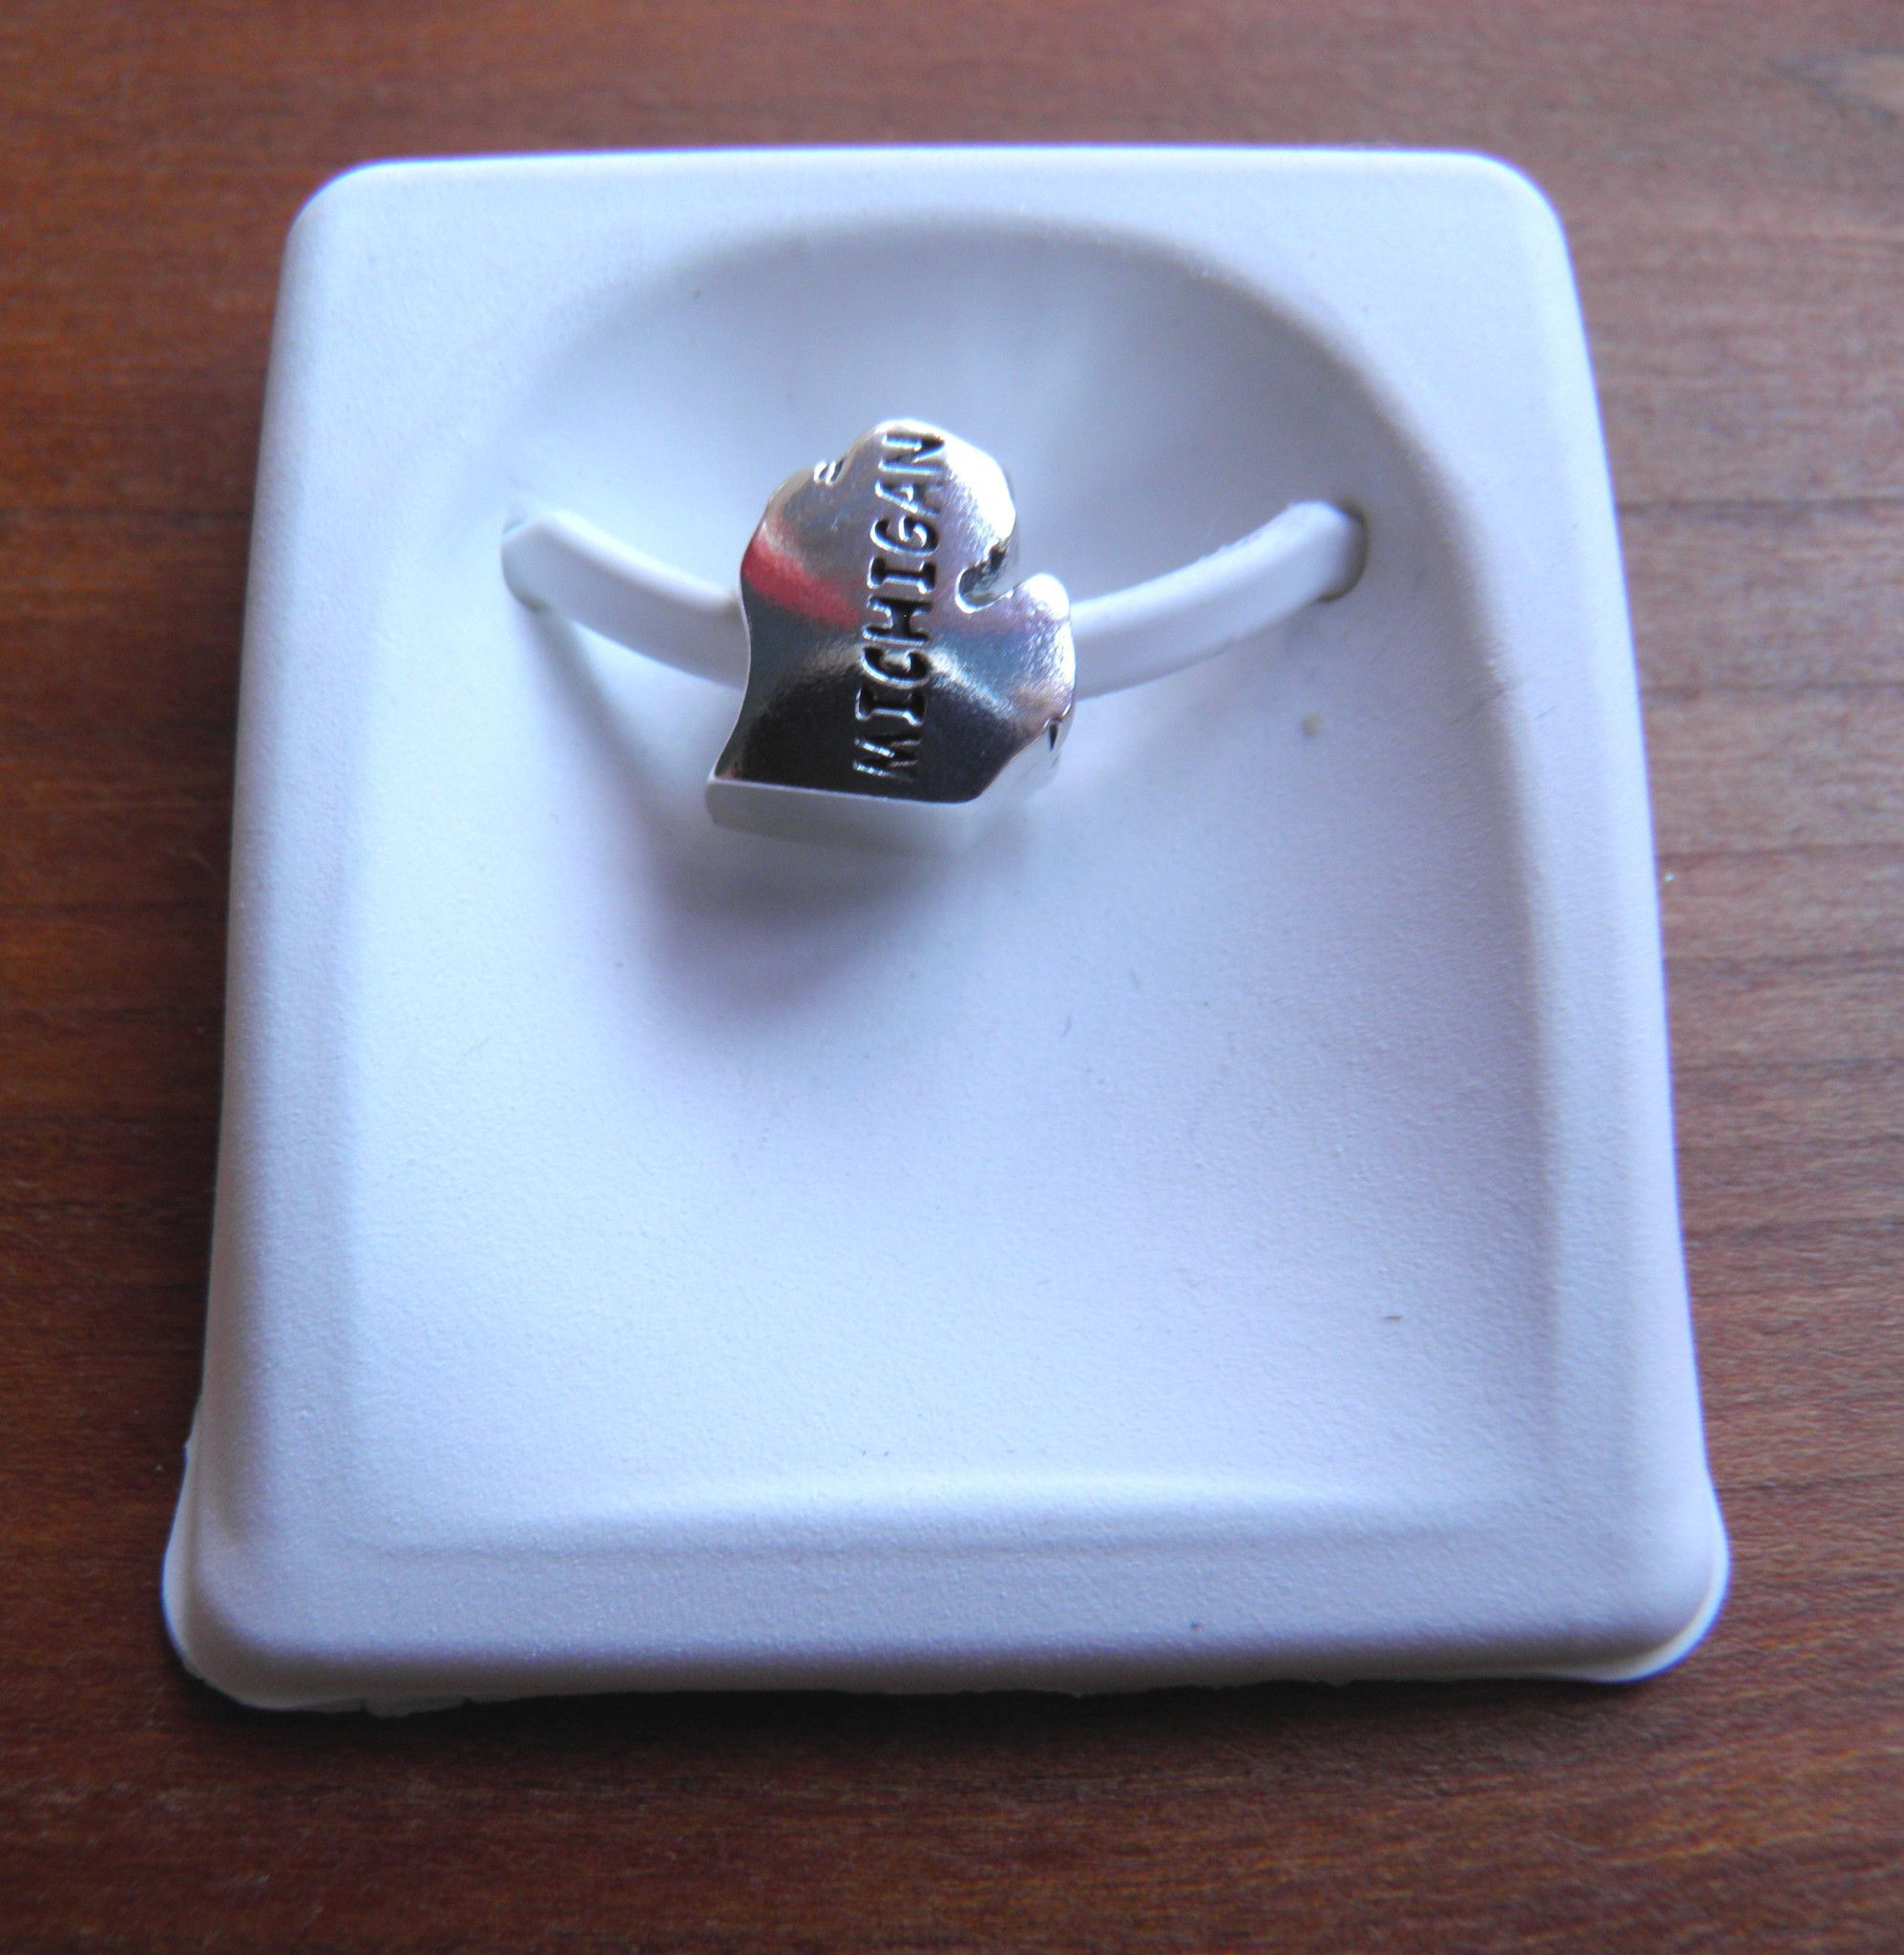 Michigan Mitten Sterling Bead For Pandora And Other Bracelets Wrist Candy Pandora Pandora Charm Bracelet